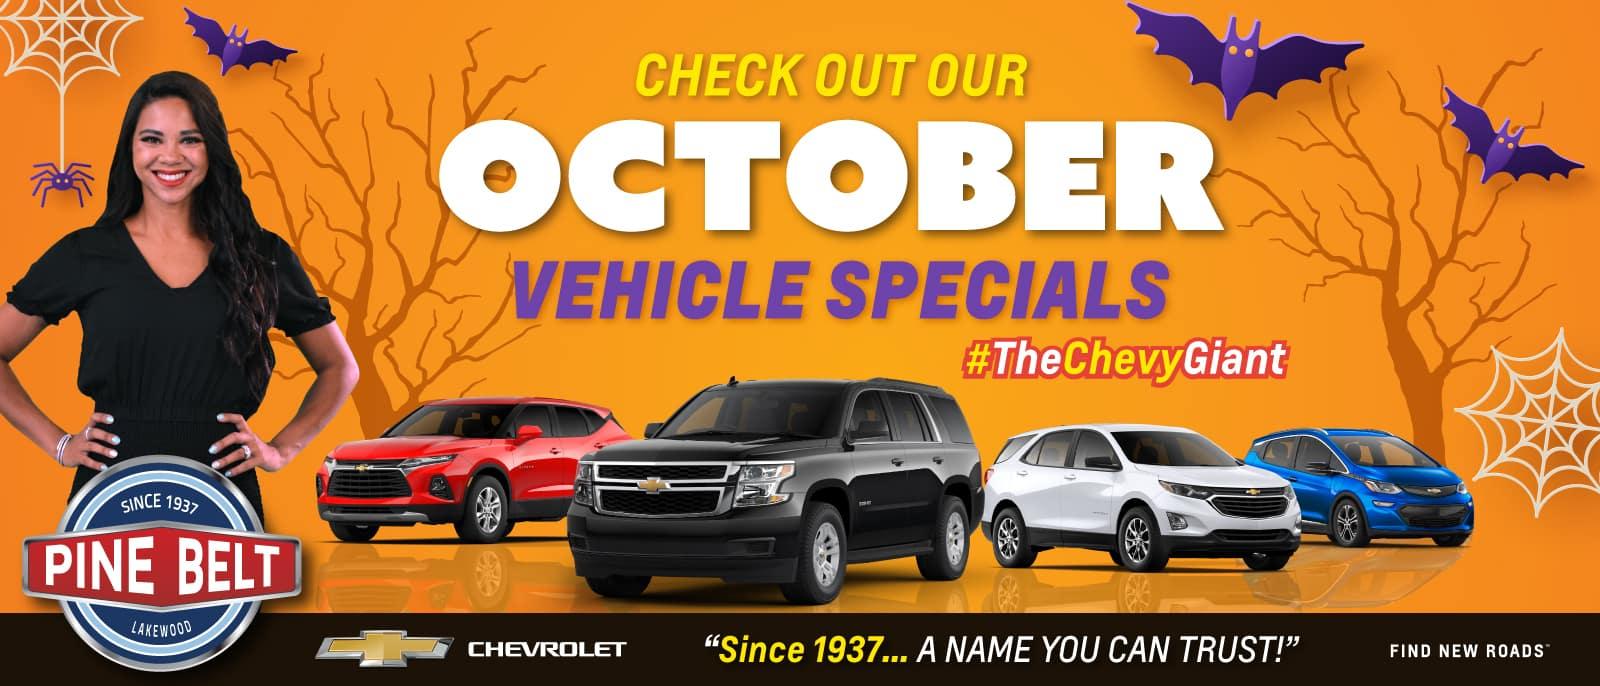 PBE-2002-October-Monthly-Specials_CHEVY